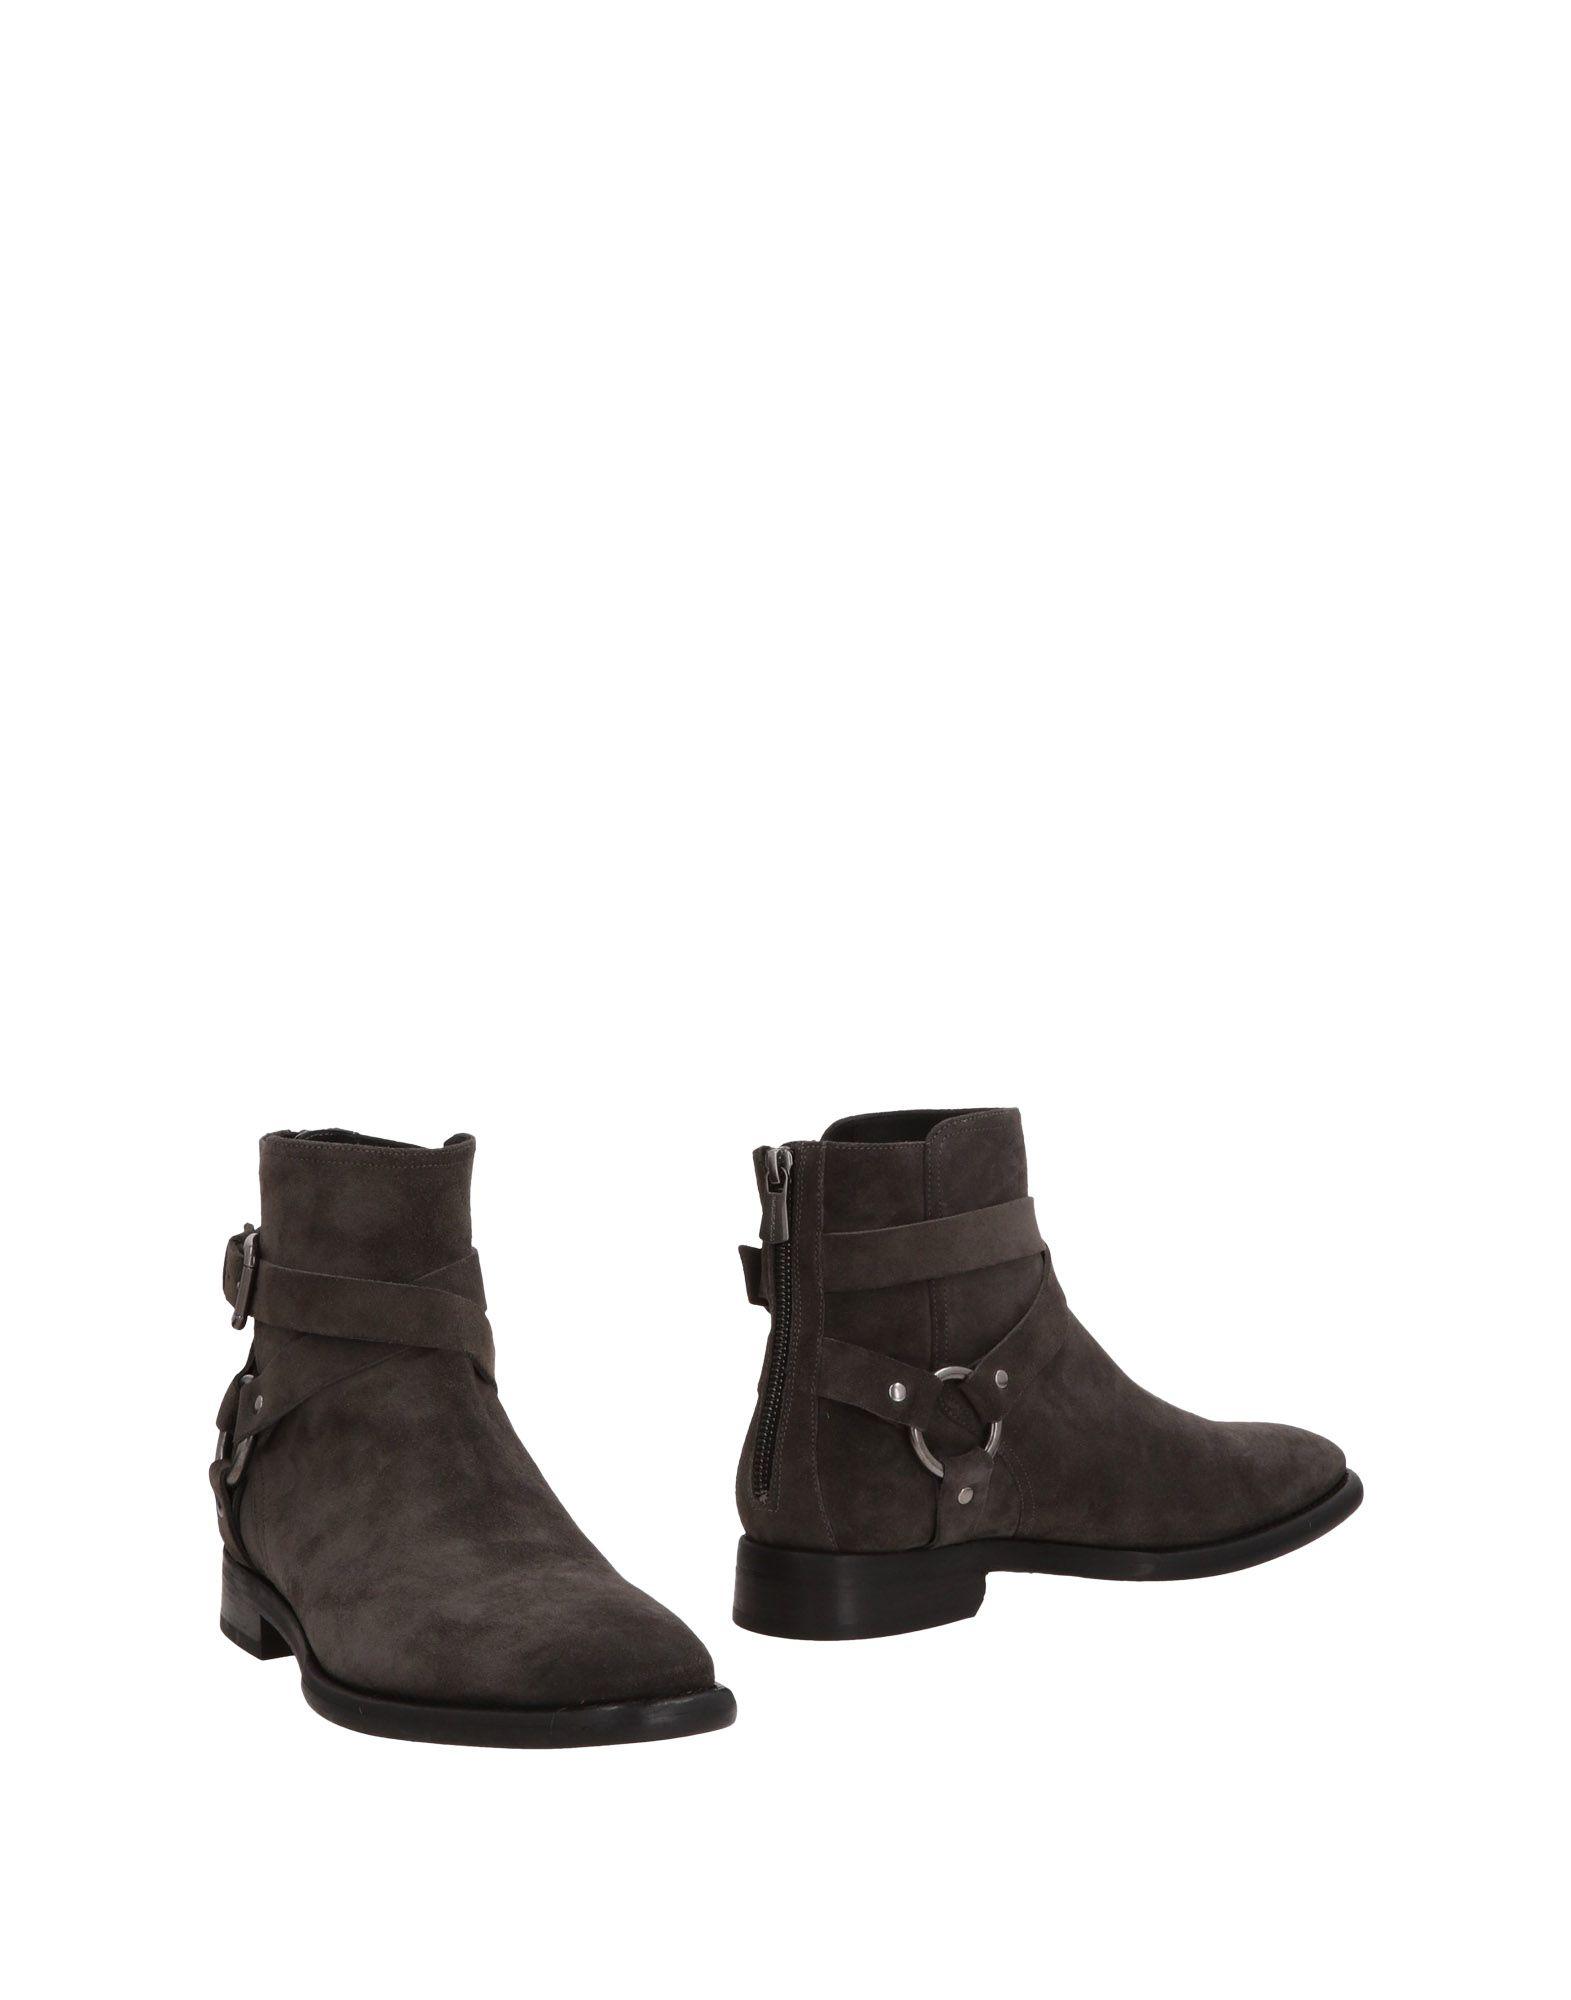 Dolce & Gabbana Boots - Men Men Men Dolce & Gabbana Boots online on  Canada - 11465859CF 8d1b47